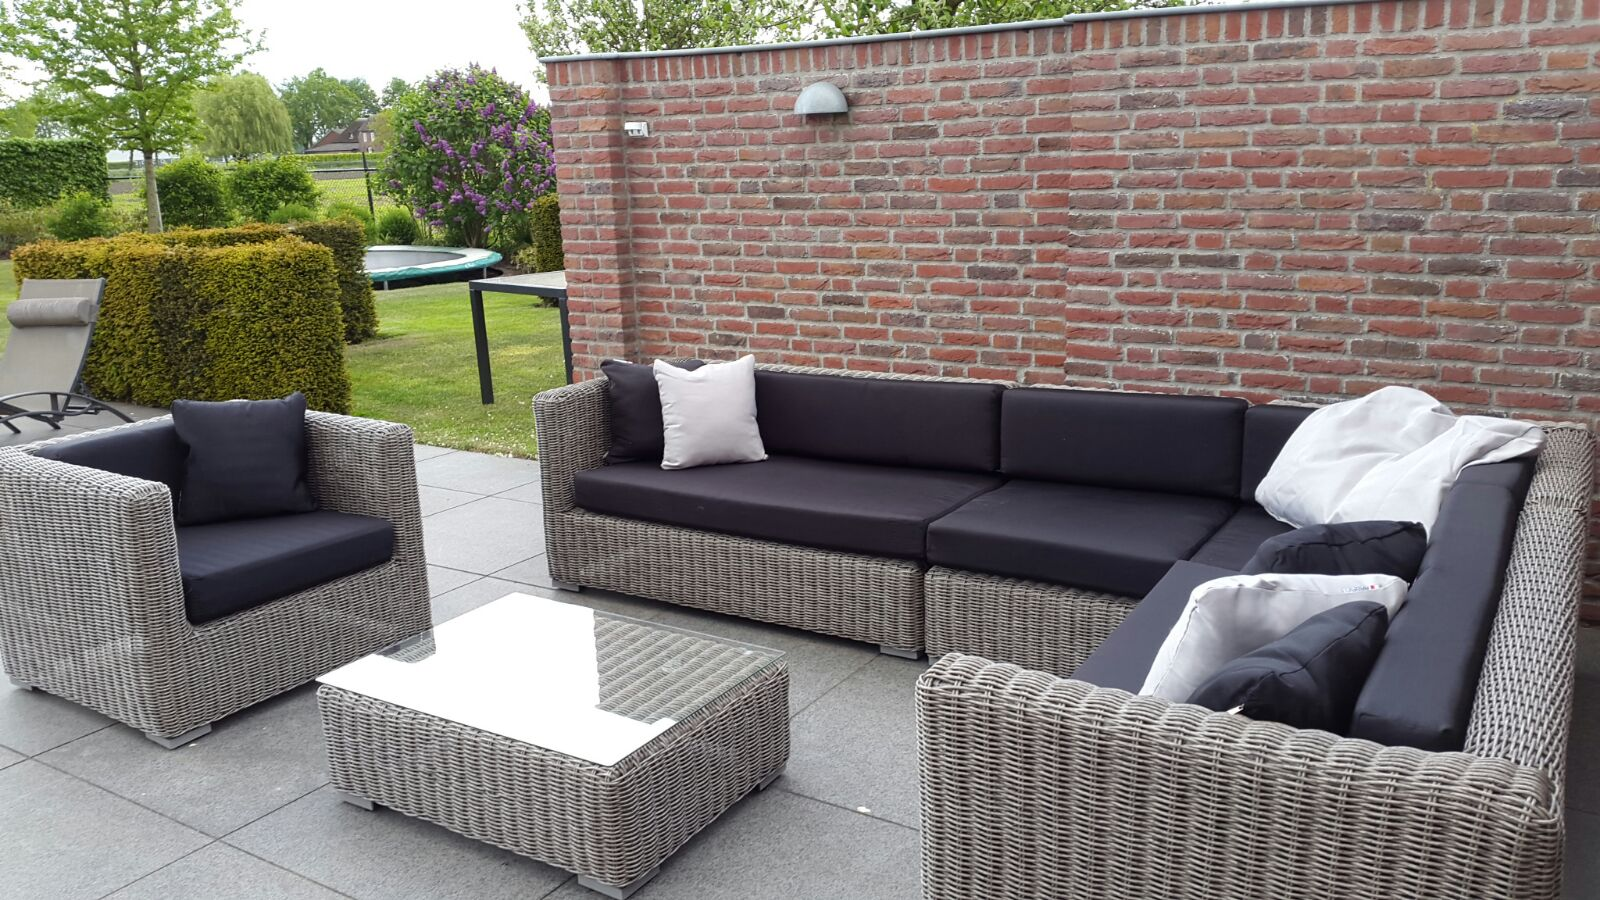 Arbrini design tuinmeubelen mei 2016 - Zwarte bank lounge ...